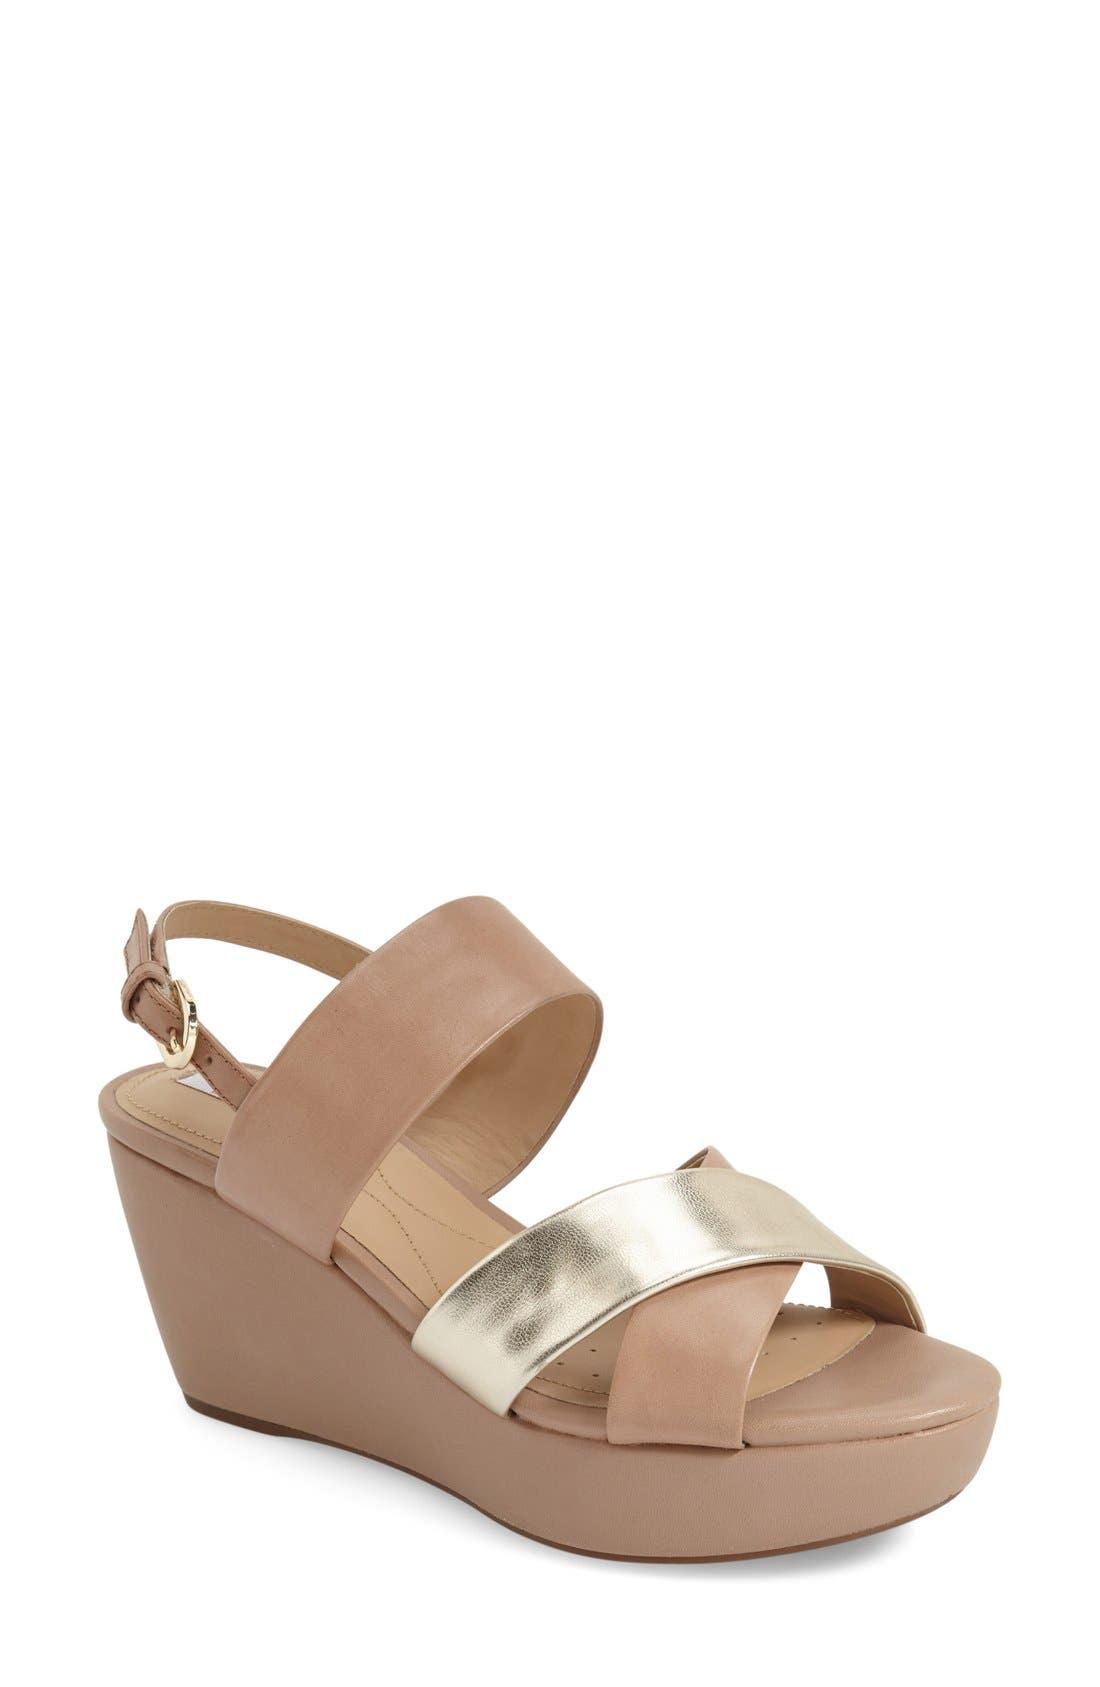 Alternate Image 1 Selected - Geox 'Thelma' Platform Wedge Sandal (Women)